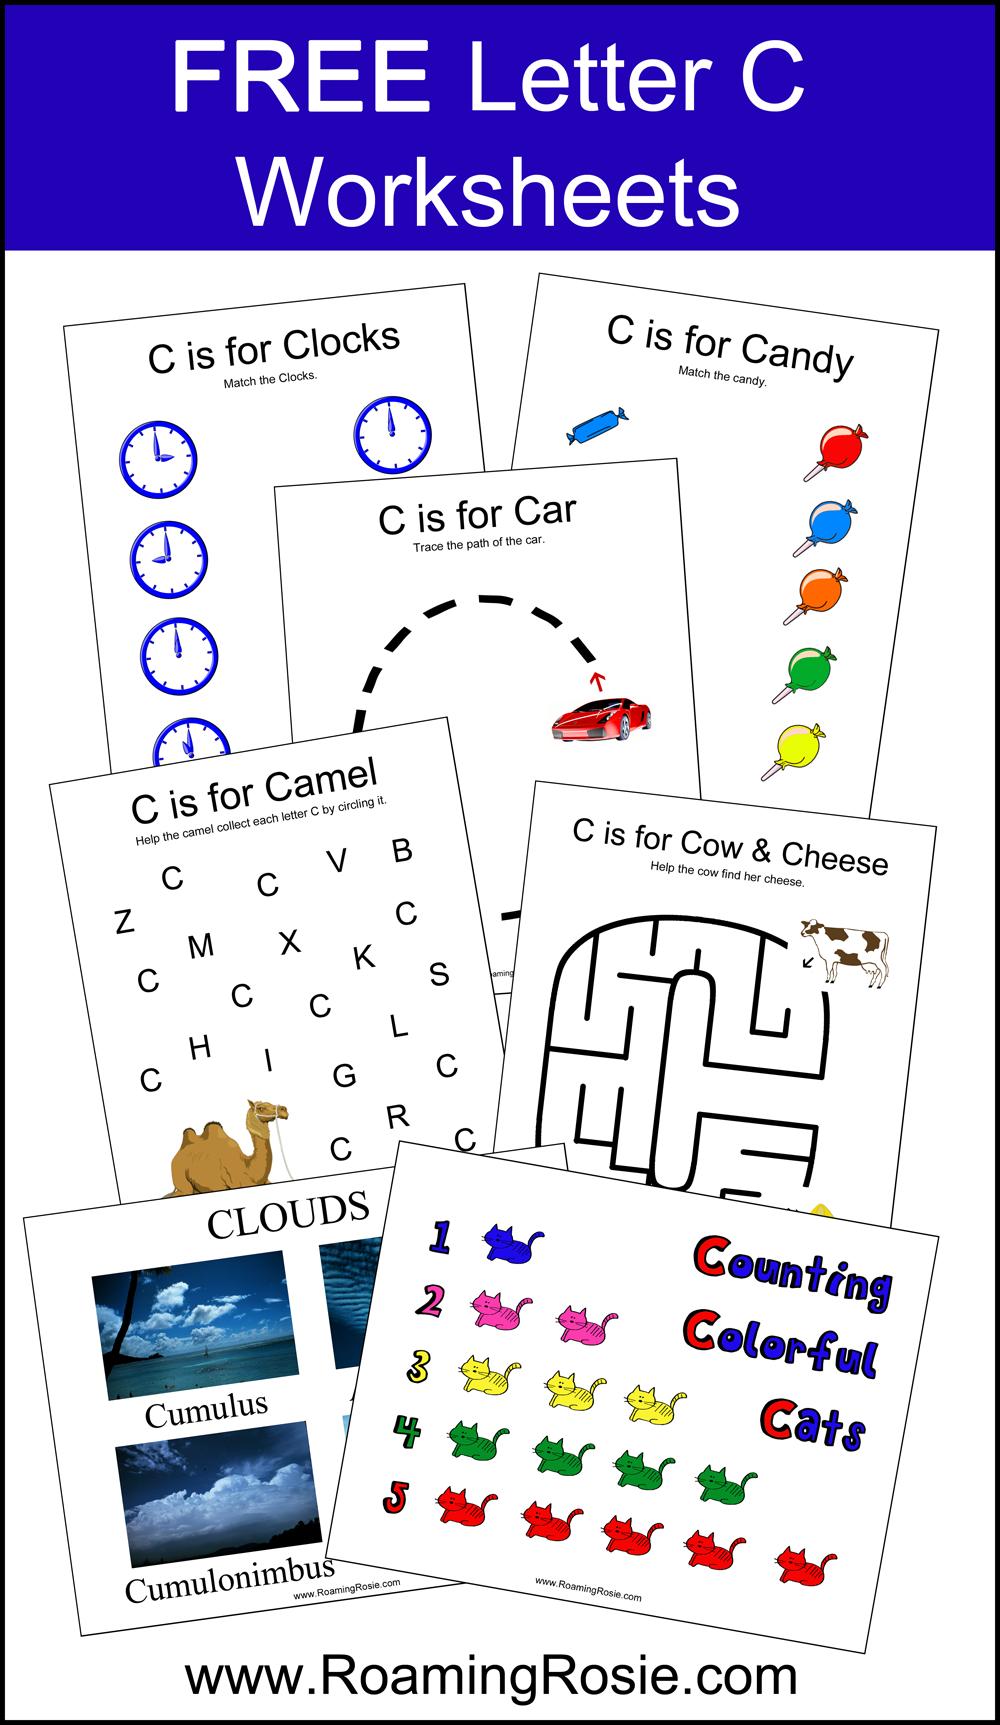 math worksheet : letter i free alphabet worksheets for kids  roaming rosie : Alphabet Worksheets For Kindergarten Free